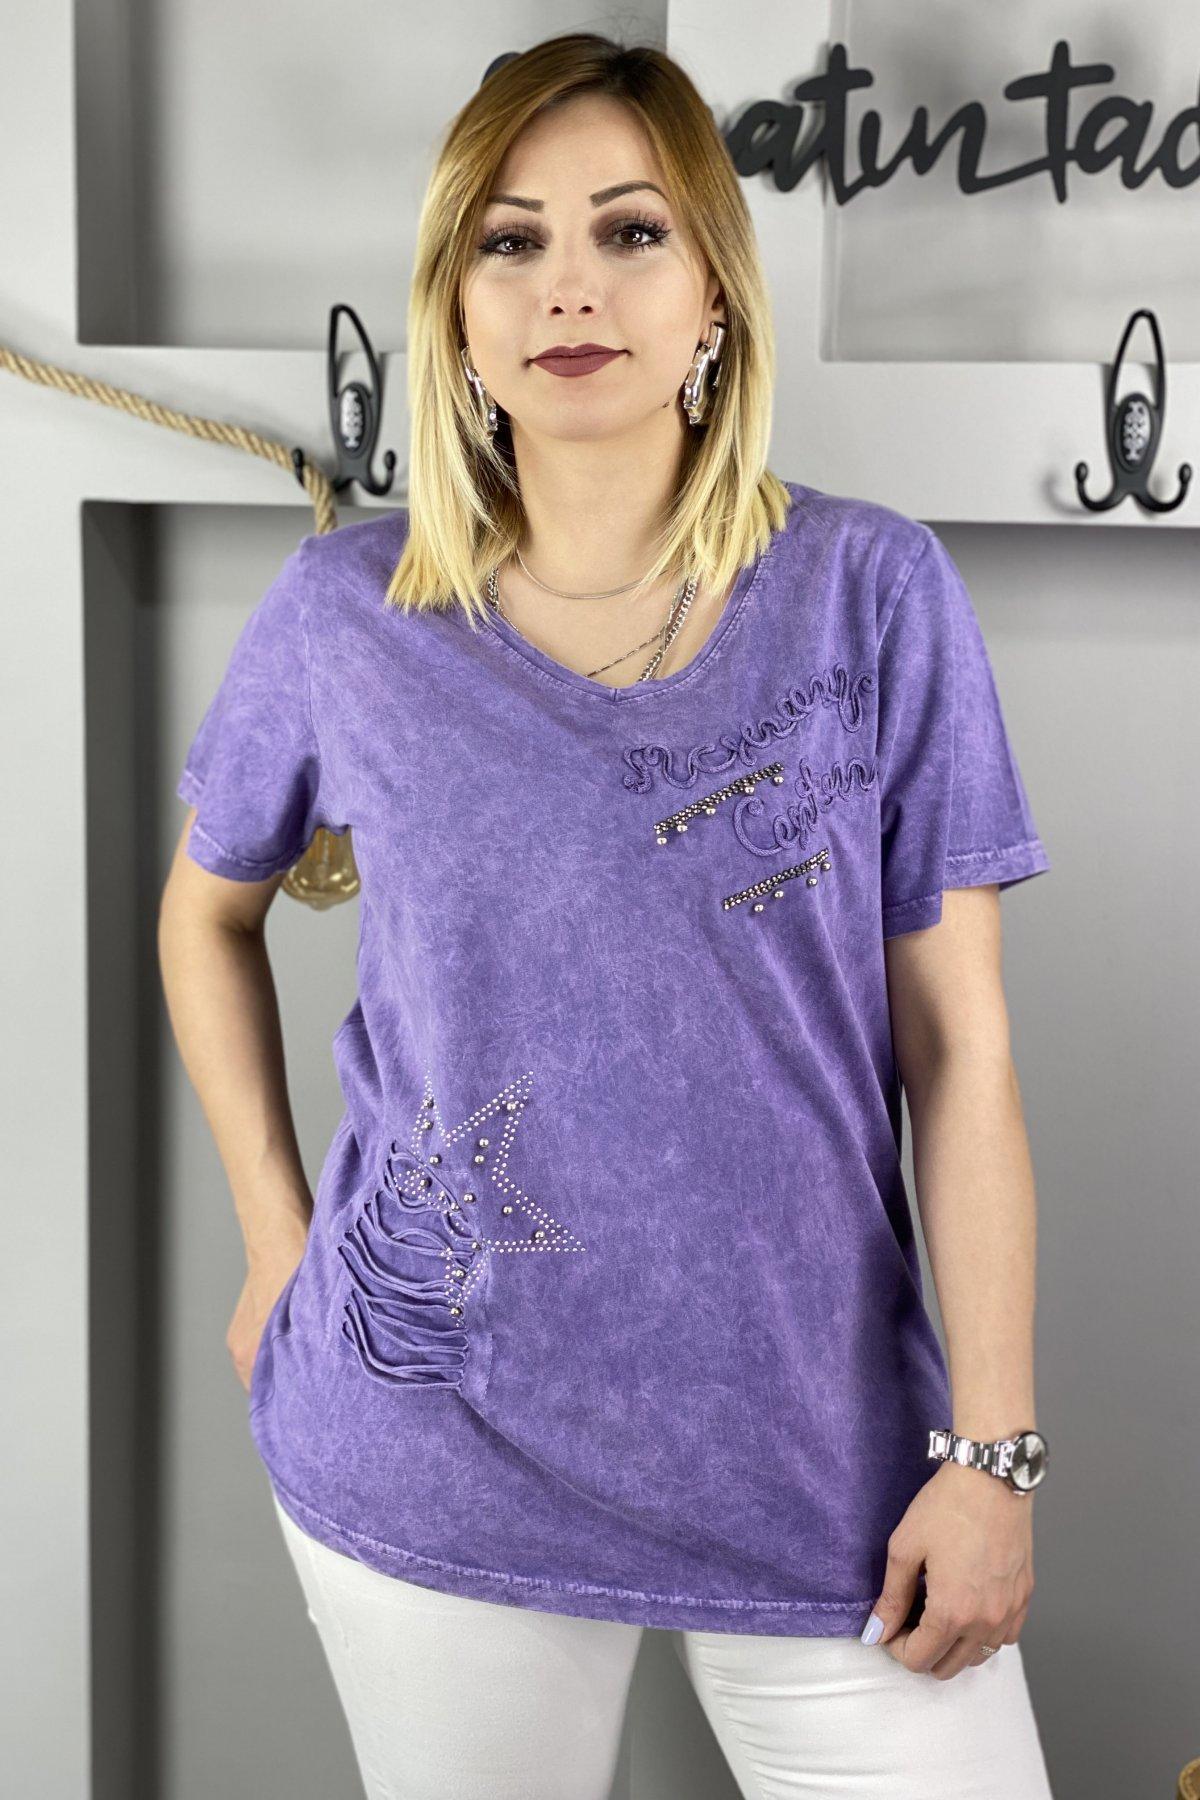 https://resim.chicbag.com.tr/p000669/lvt/sol-gogus-ustu-yazili-sag-tarafi-kesik-ustune-yildiz-detayli-v-yaka-kisa-kollu-t-shirt-01254e7e7a0b.jpg